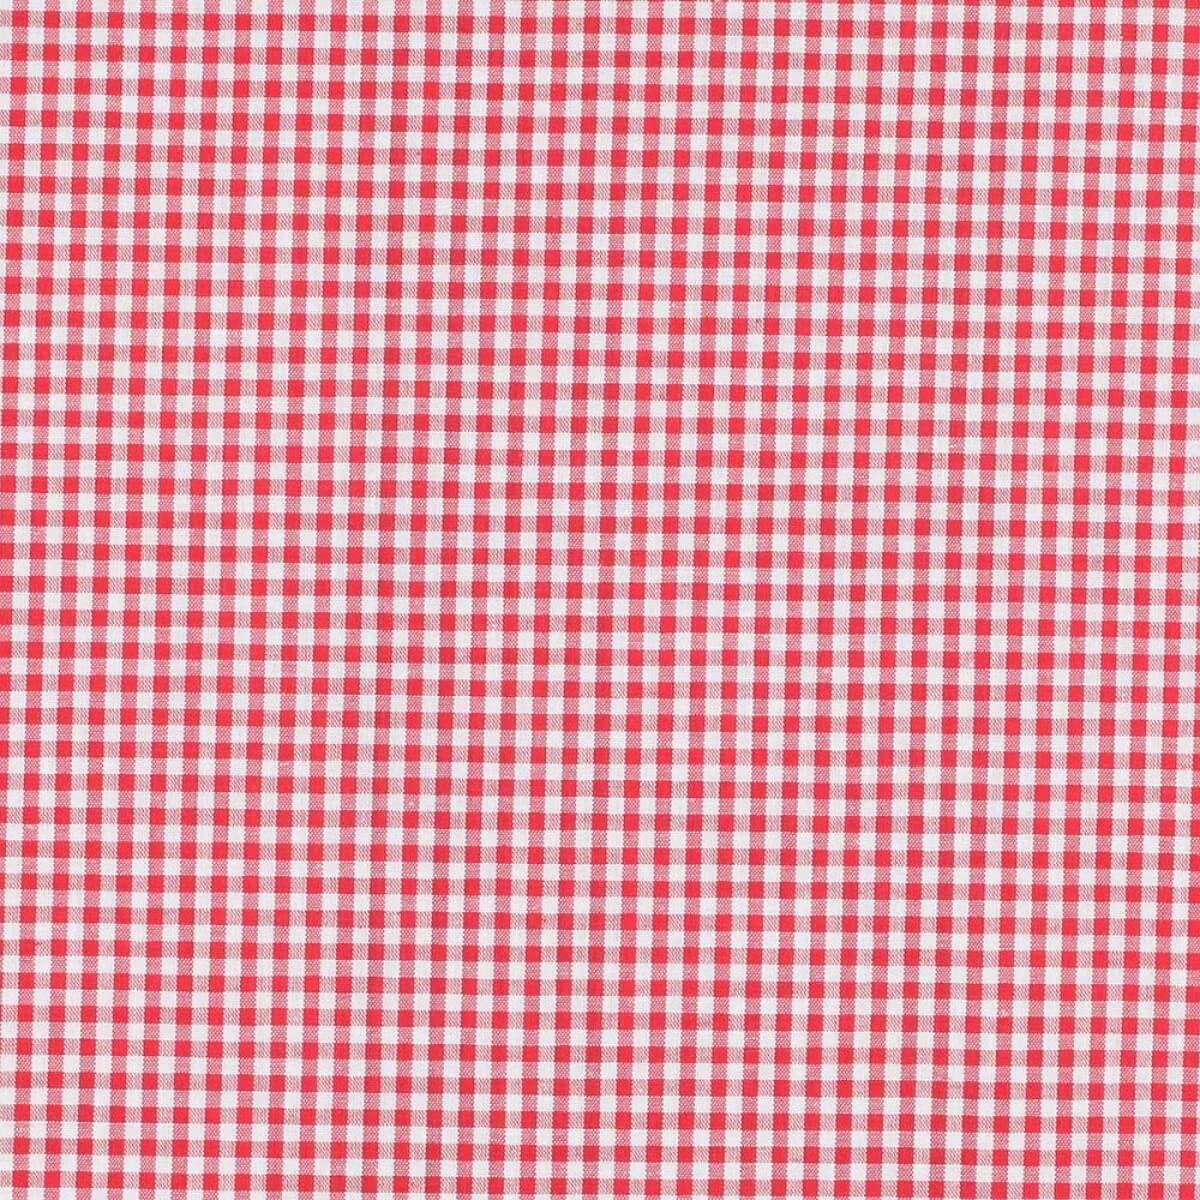 tissu petit vichy rouge blanc merceriecar. Black Bedroom Furniture Sets. Home Design Ideas